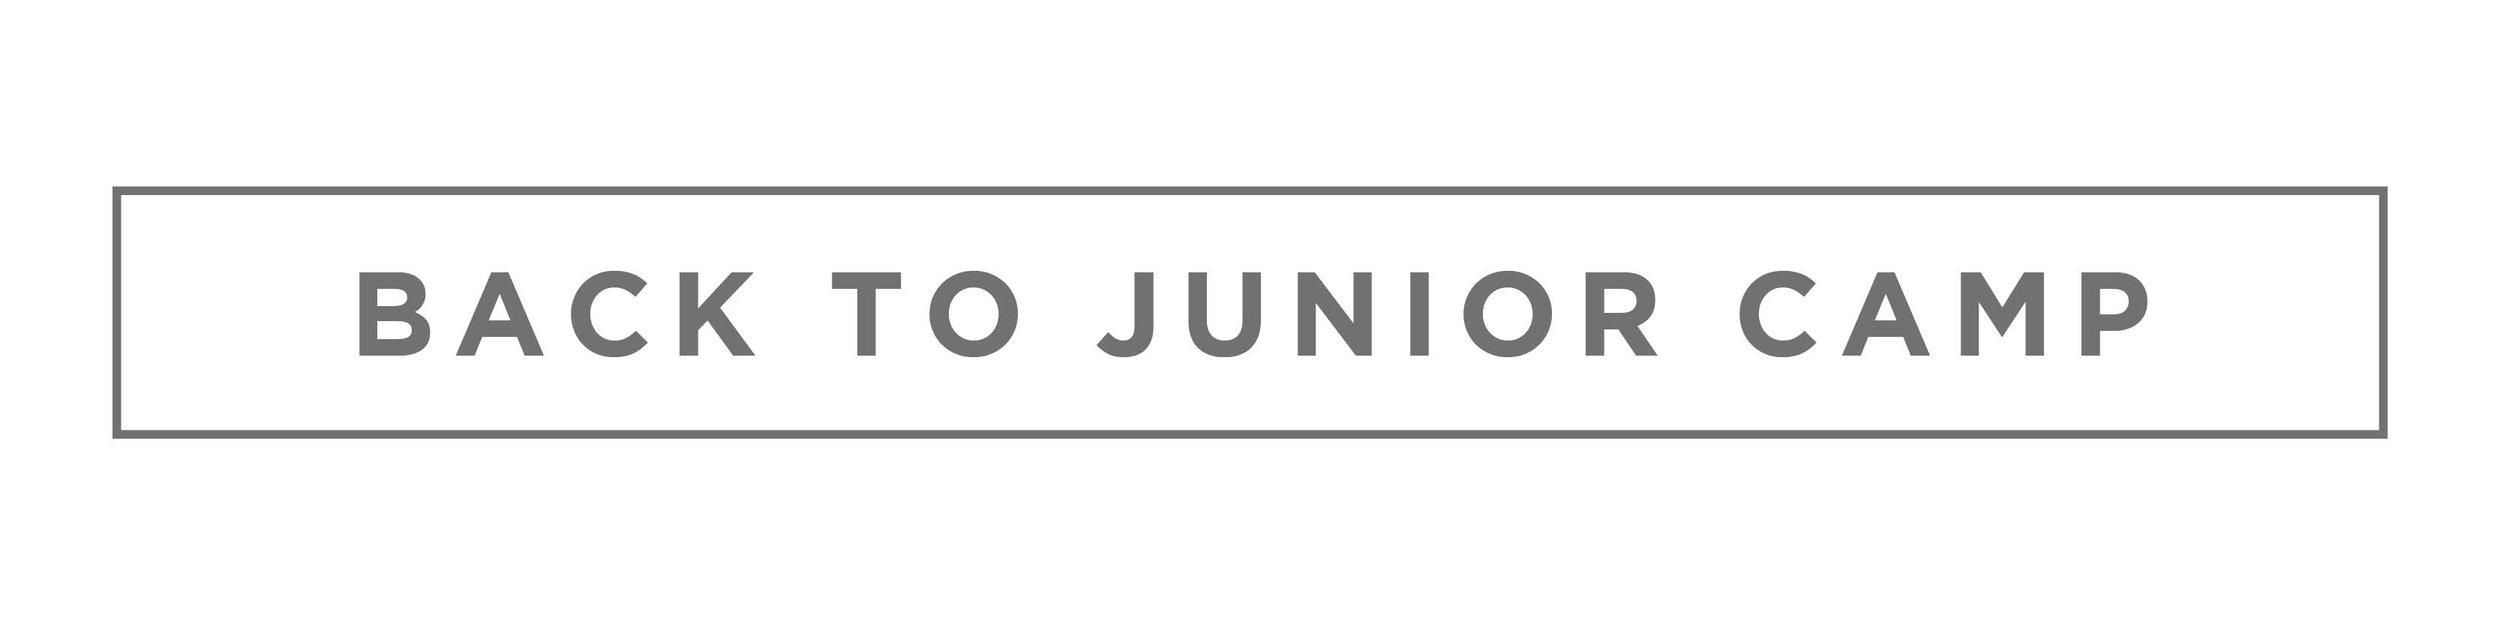 back to junior camp.jpg